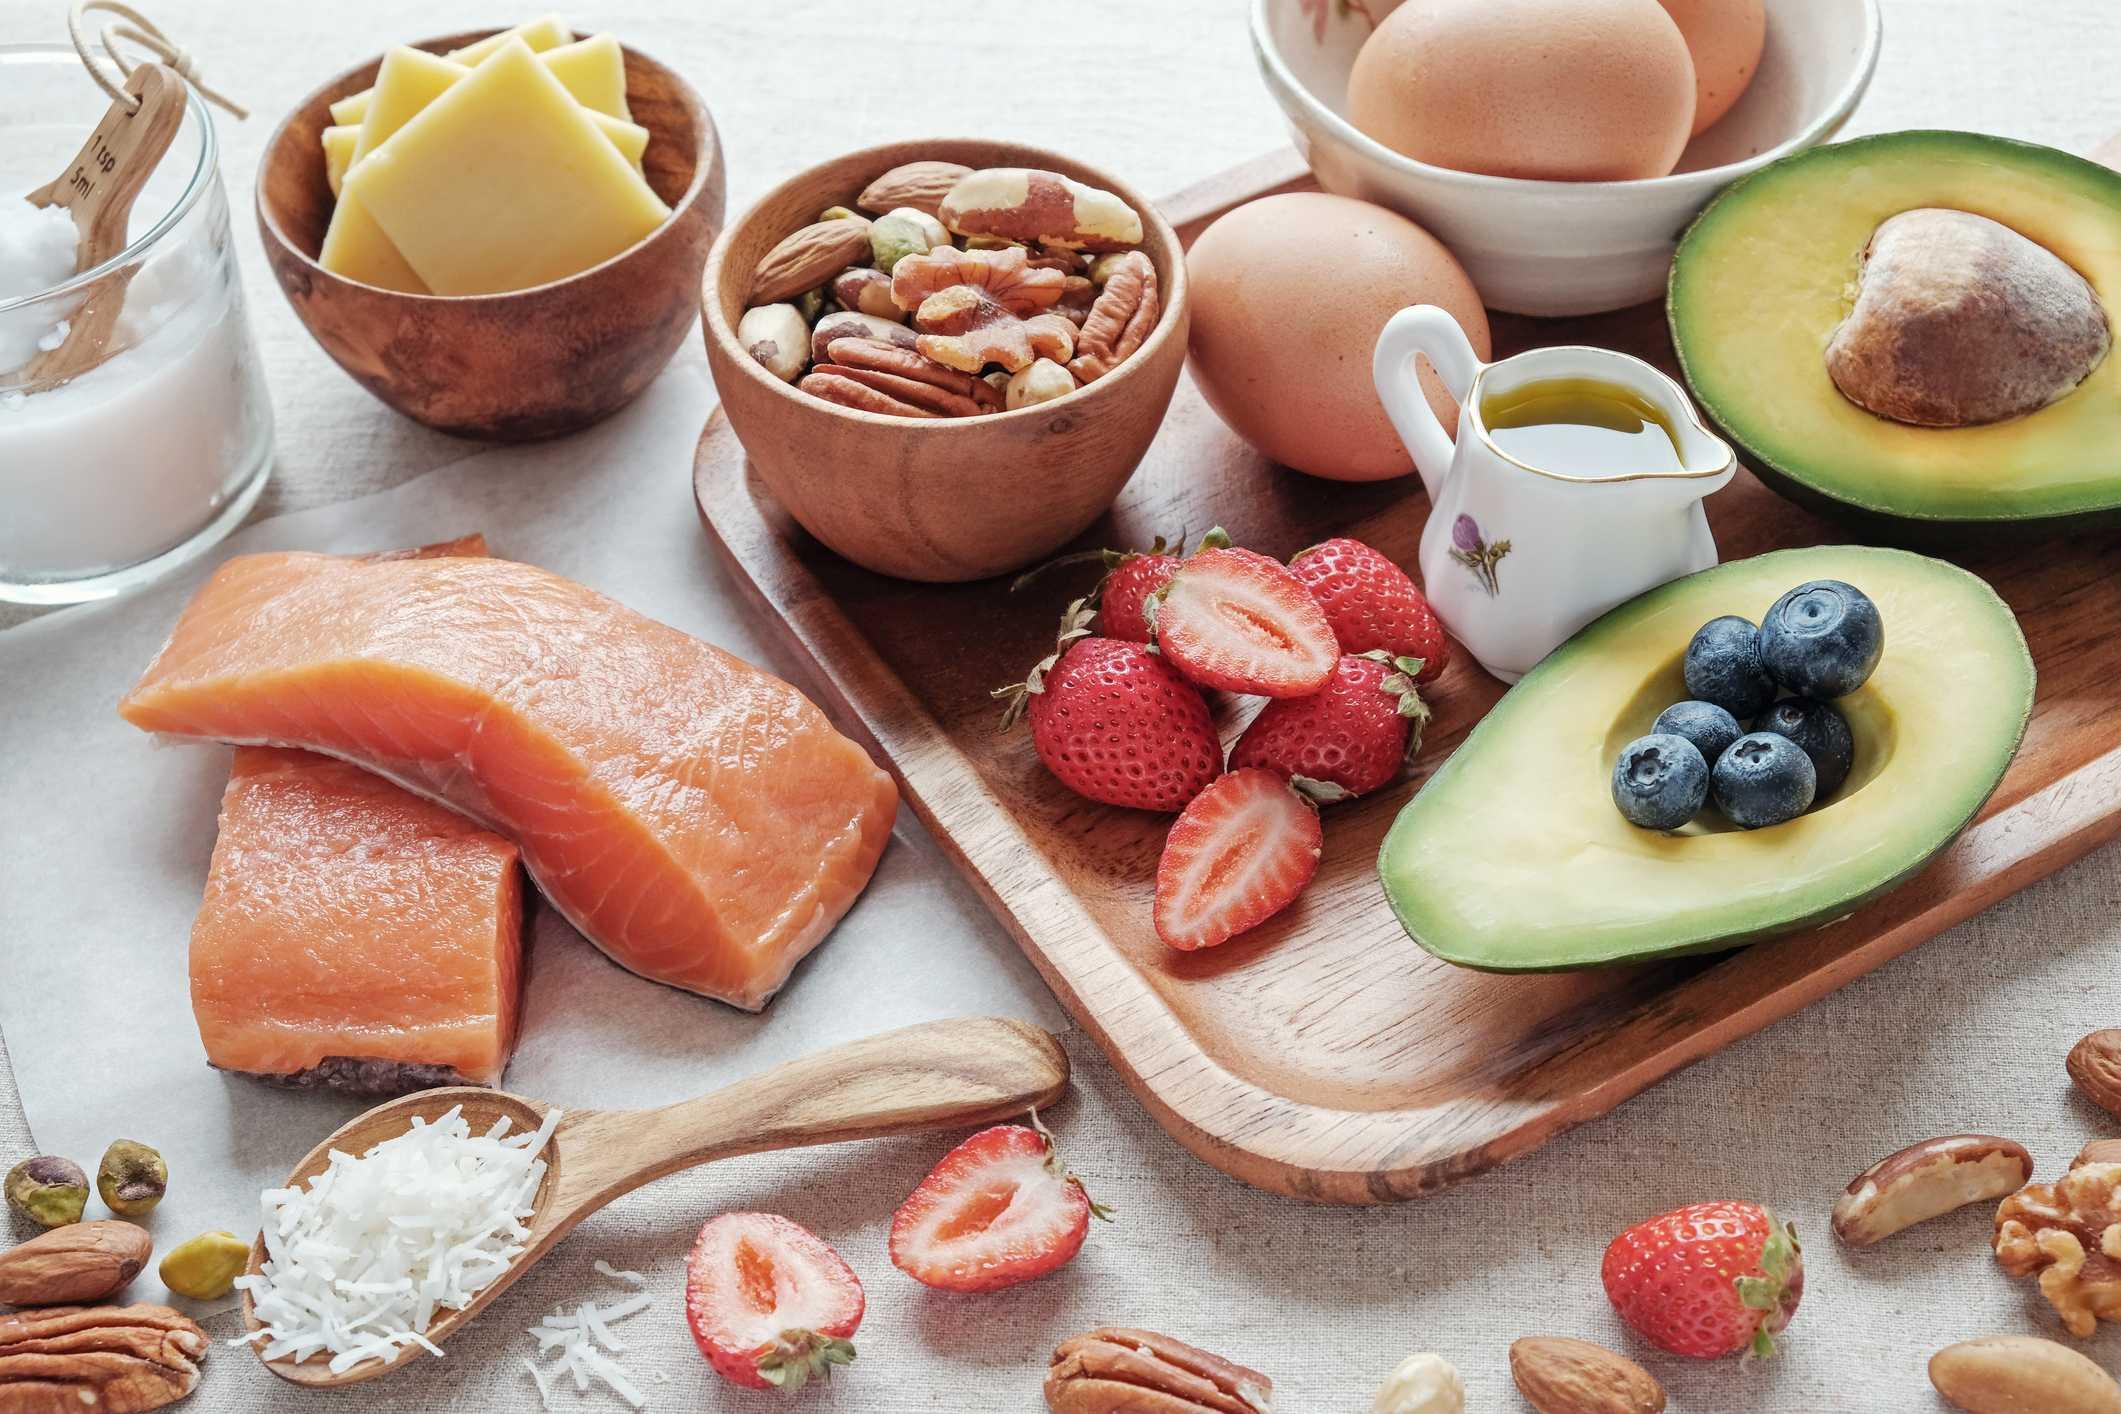 paleo diet health benefits and risks